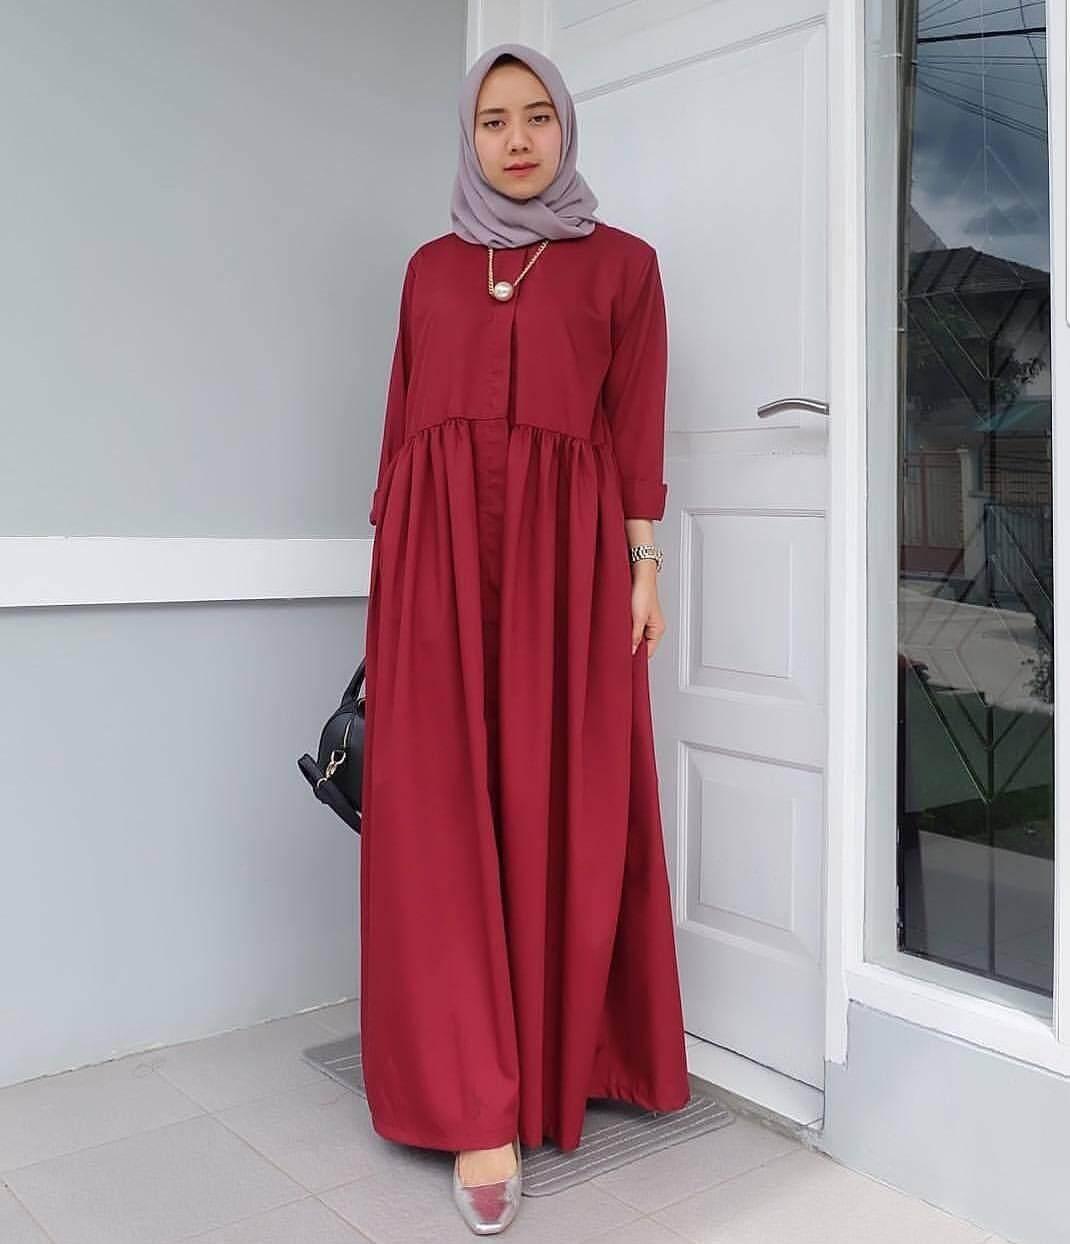 Stelan Celana Kulot 34 Berlengan Pendek Batik Print Spt002 06e 3 4 01 Spt001 03d Source Dpt005 36 Muslimah